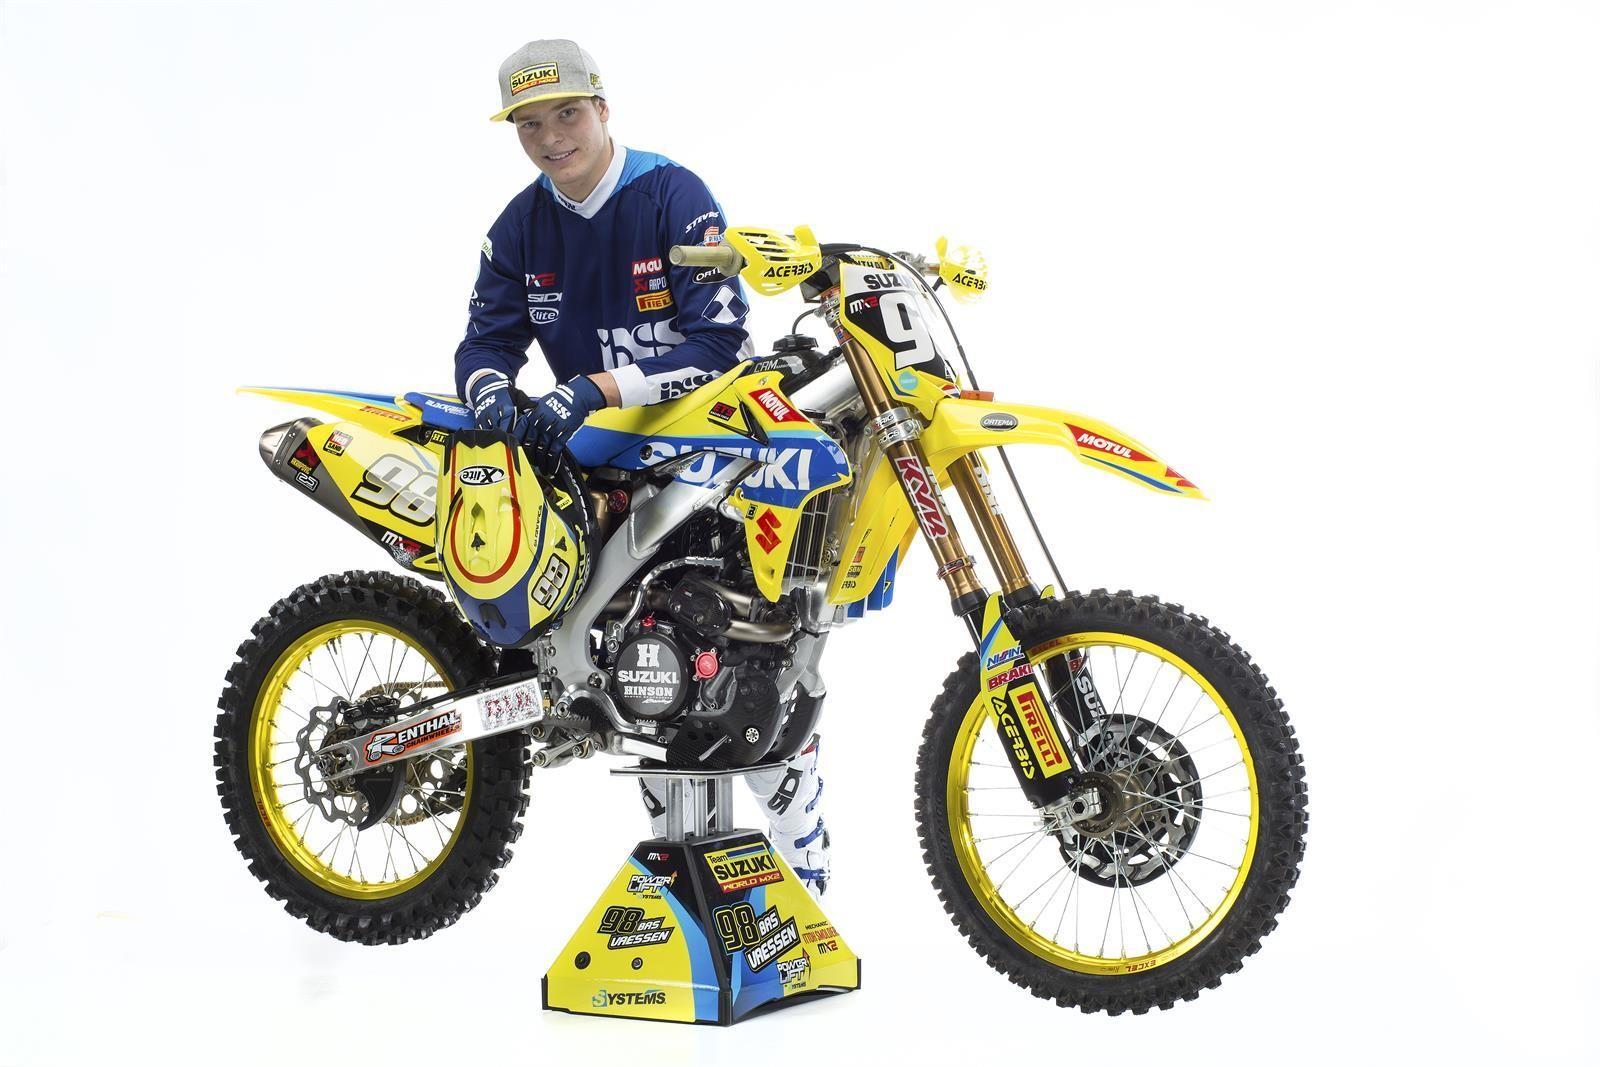 Bas Vaessen and his 2017 Suzuki World MX2 RM-Z250 - First Look: 2017 Suzuki World MX2 Team - Motocross Pictures - Vital MX